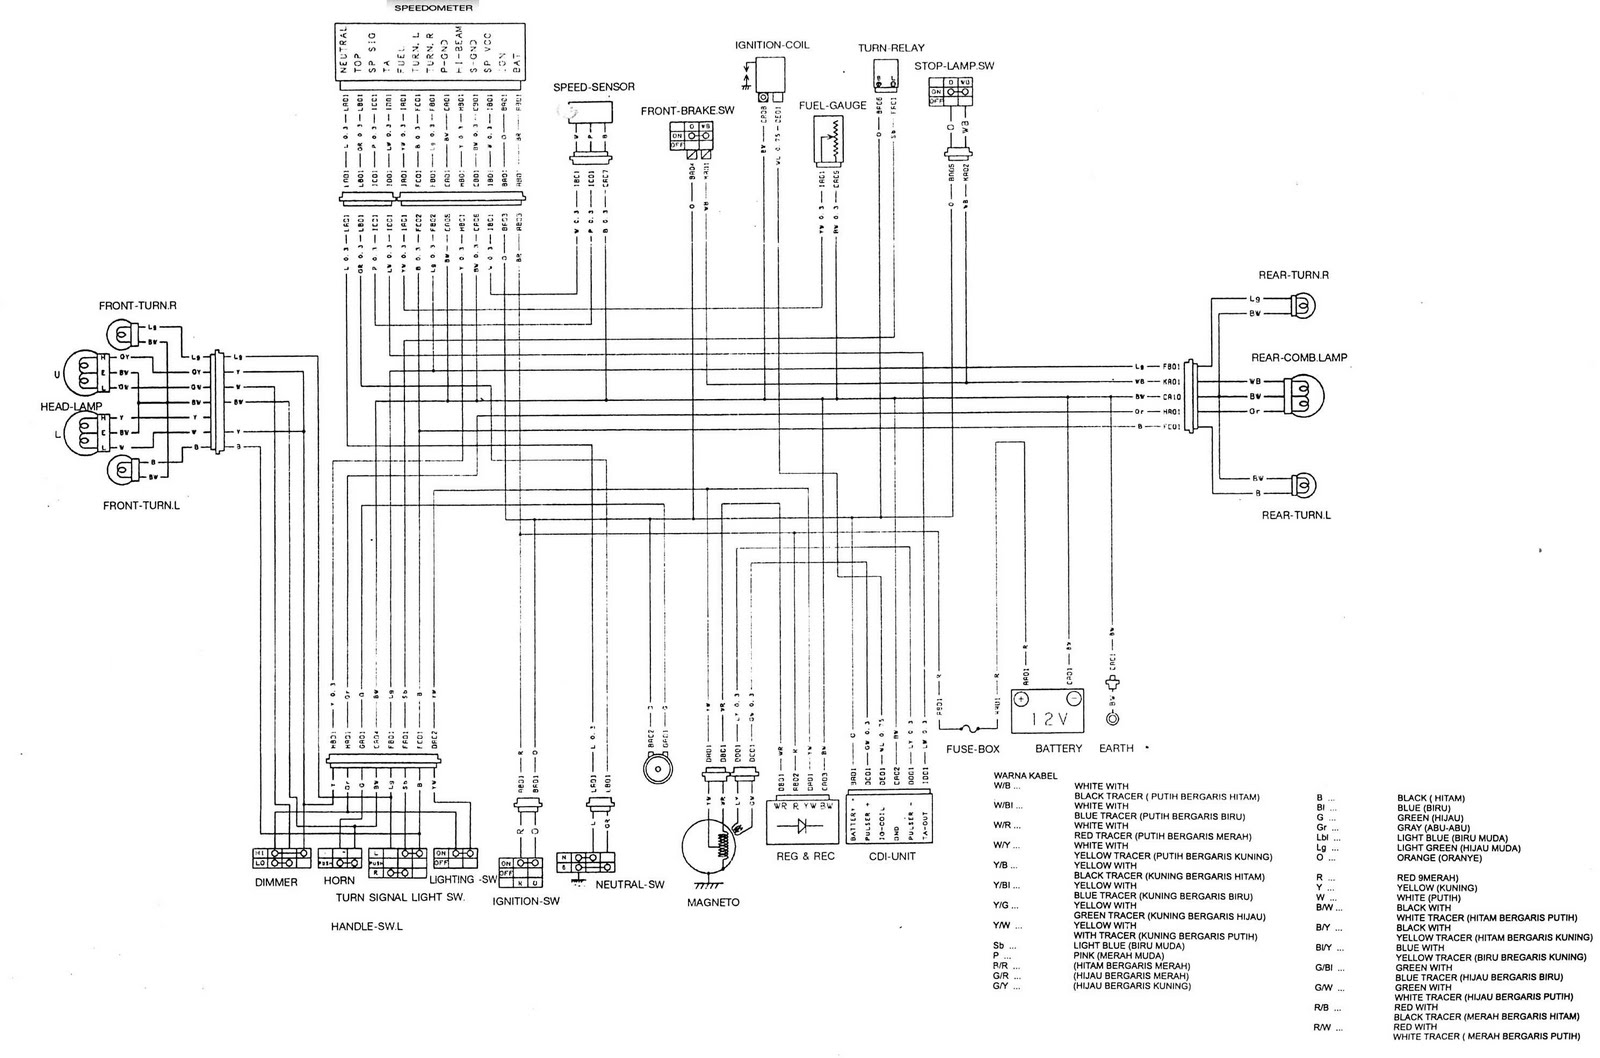 wrg 8908 motofino wiring diagramverucci wiring diagram verucci free engine image for verucci luggage verucci [ 1600 x 1058 Pixel ]